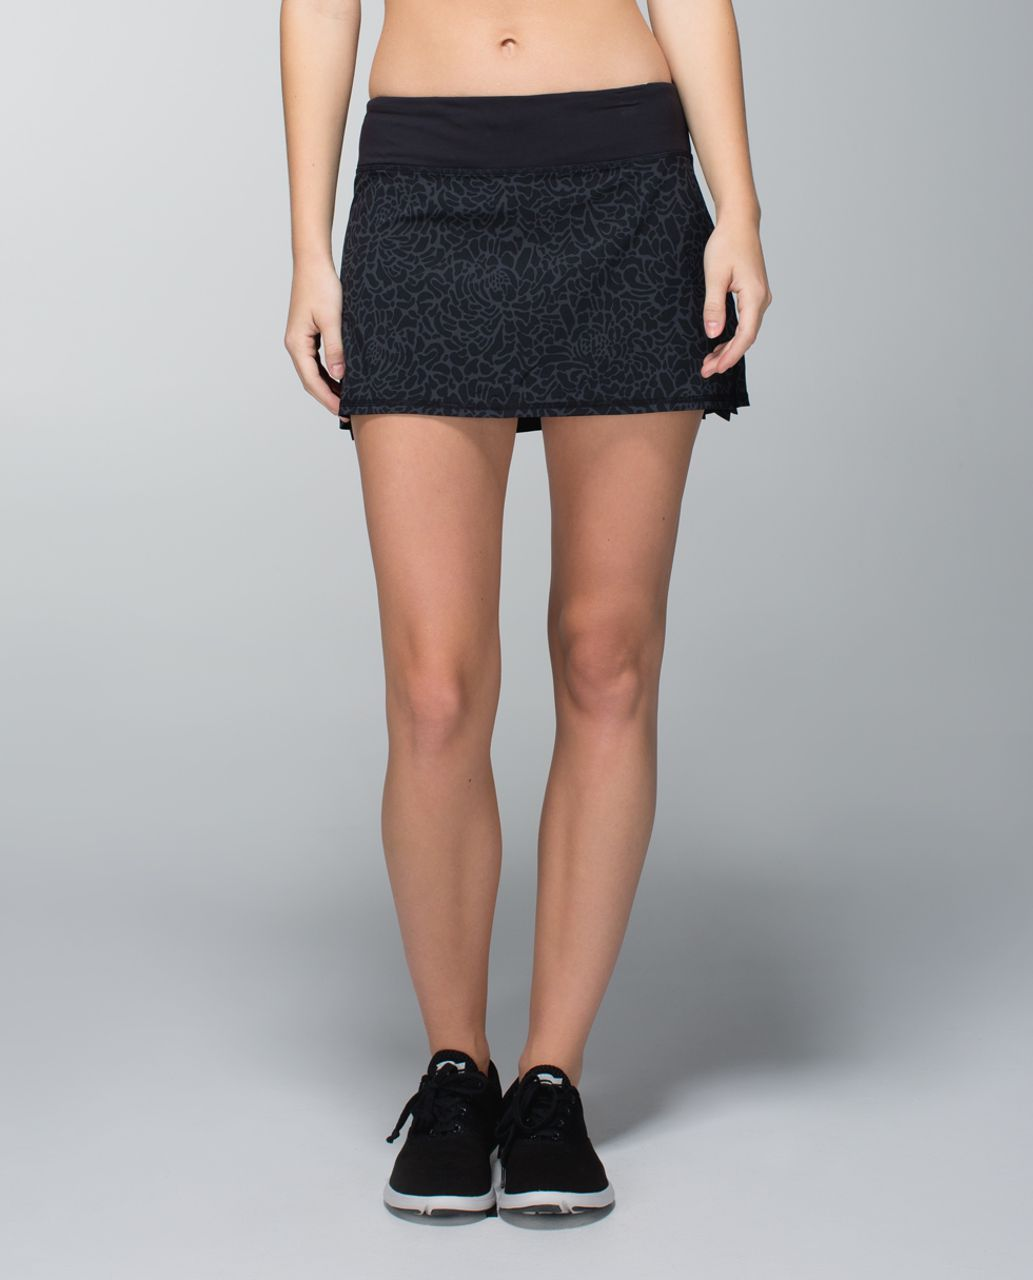 Lululemon Run:  Pace Setter Skirt *4-way Stretch (Regular) - Petal Camo Printed Black Deep Coal / Black